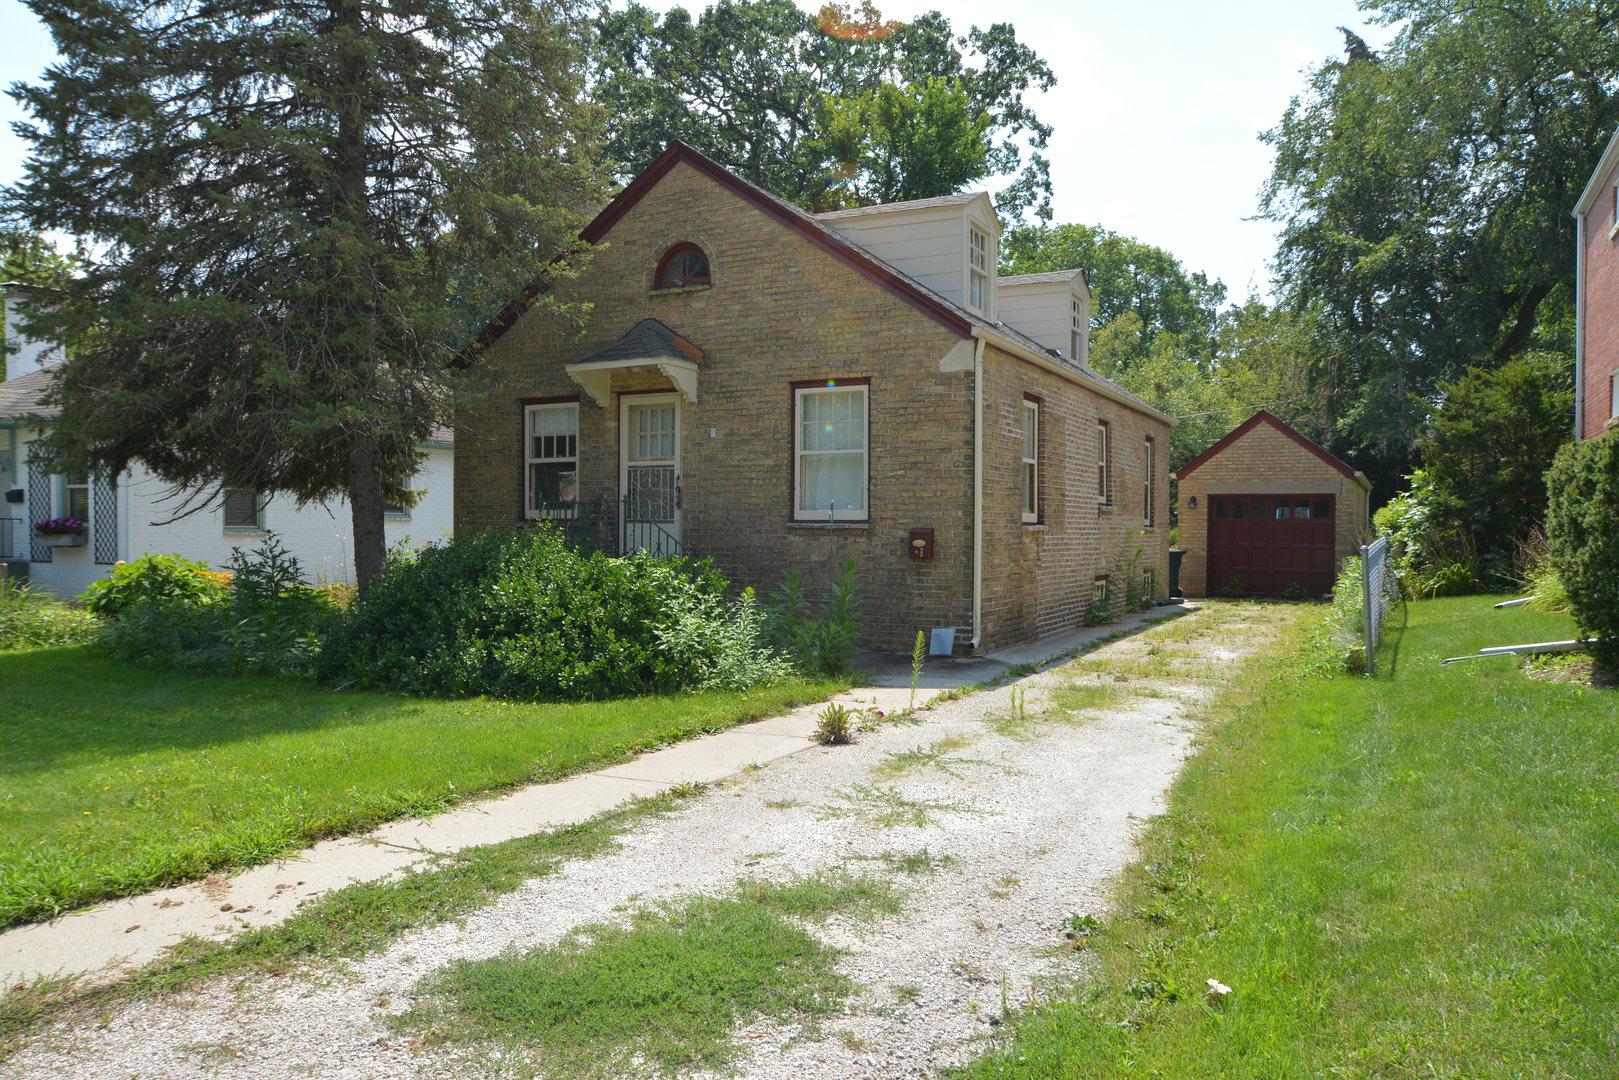 15 East Washington Avenue, Lake Bluff, Illinois 60044